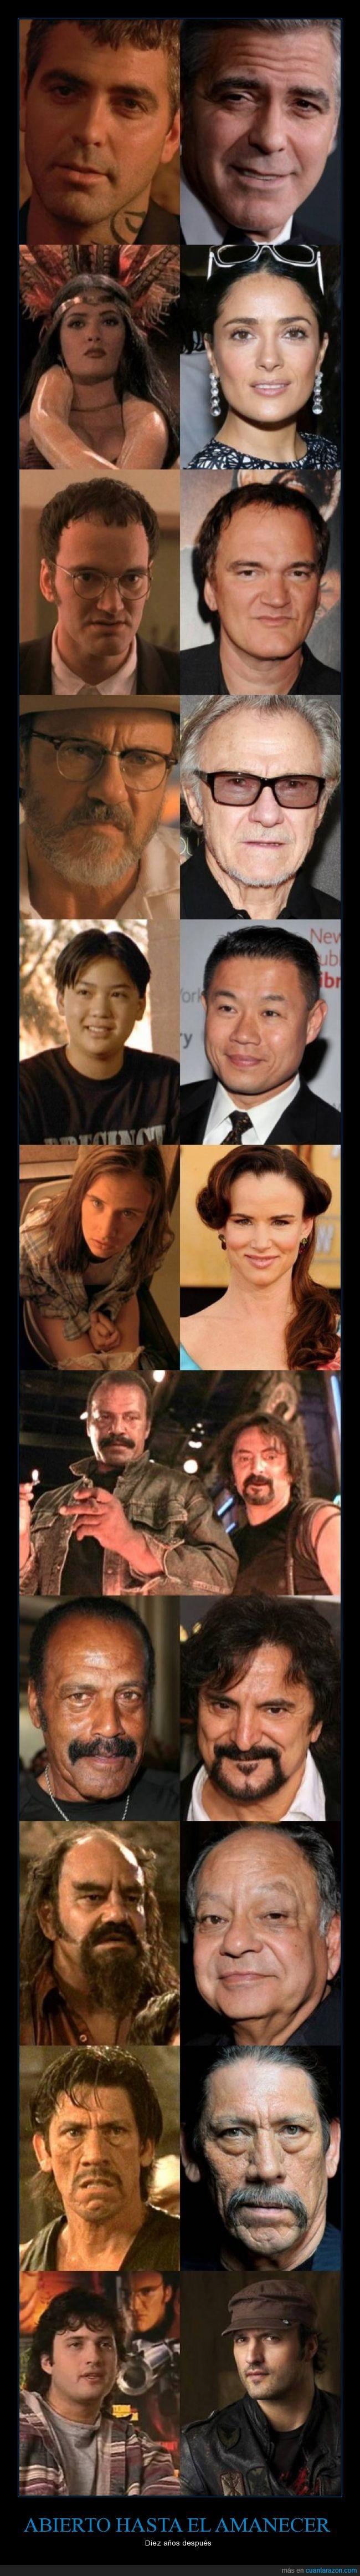 abierto,amanecer,Dany Trejo,dawn,evolucion,George Clooney,hasta,Juliette Lewis,Quentin Tarantino,Robert Rodriguez,Salma Hayek,til